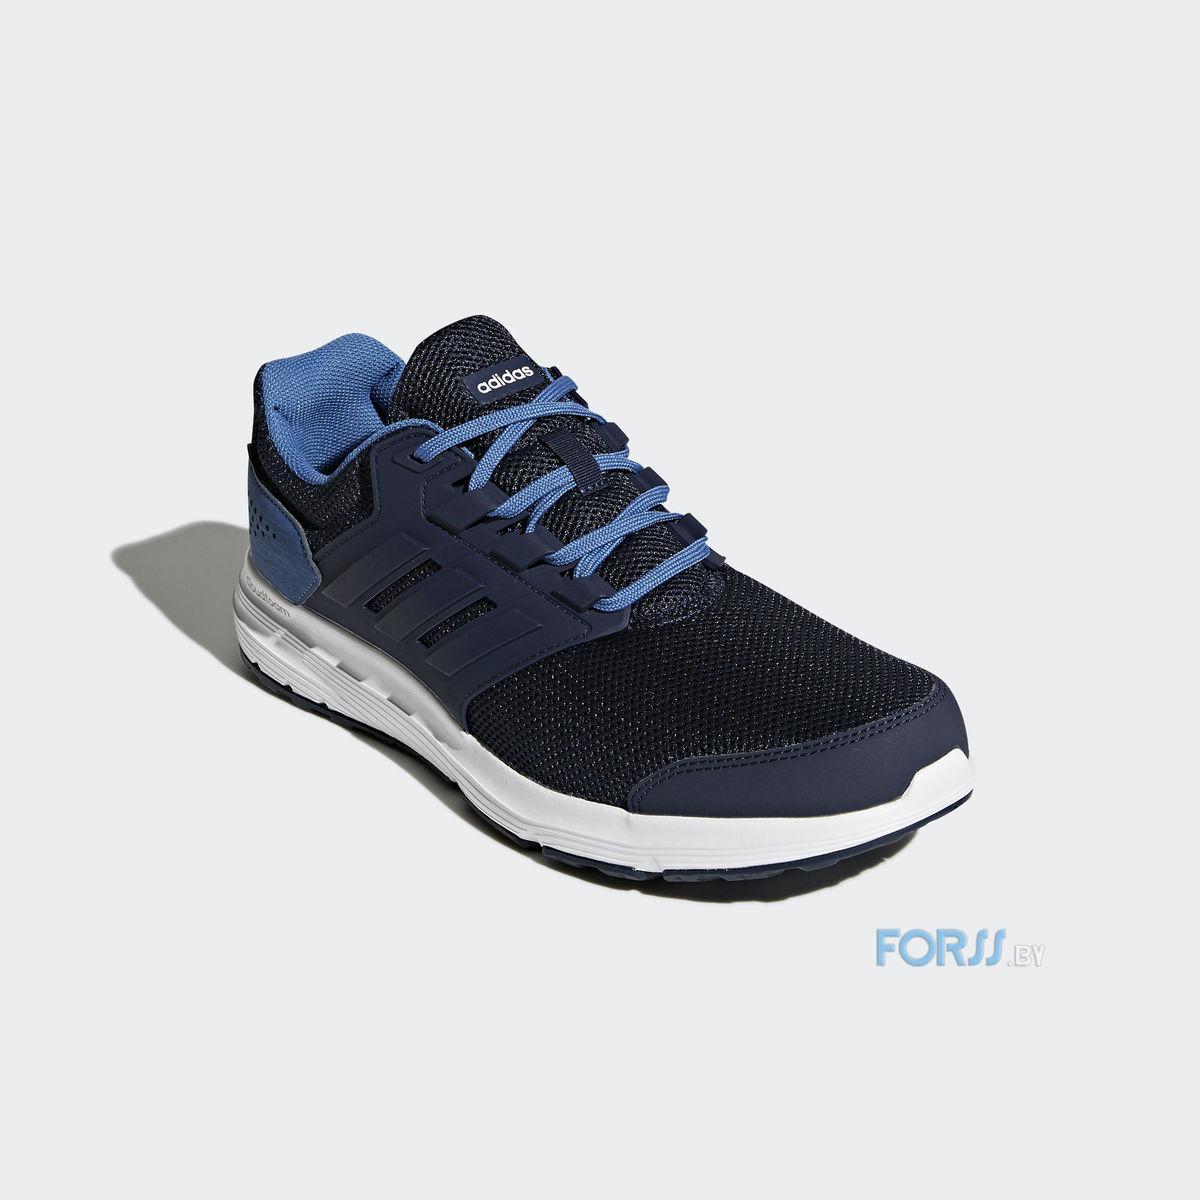 Adidas Sepatu Running Galaxy 4 M - CP8828 - Navy b972b46397